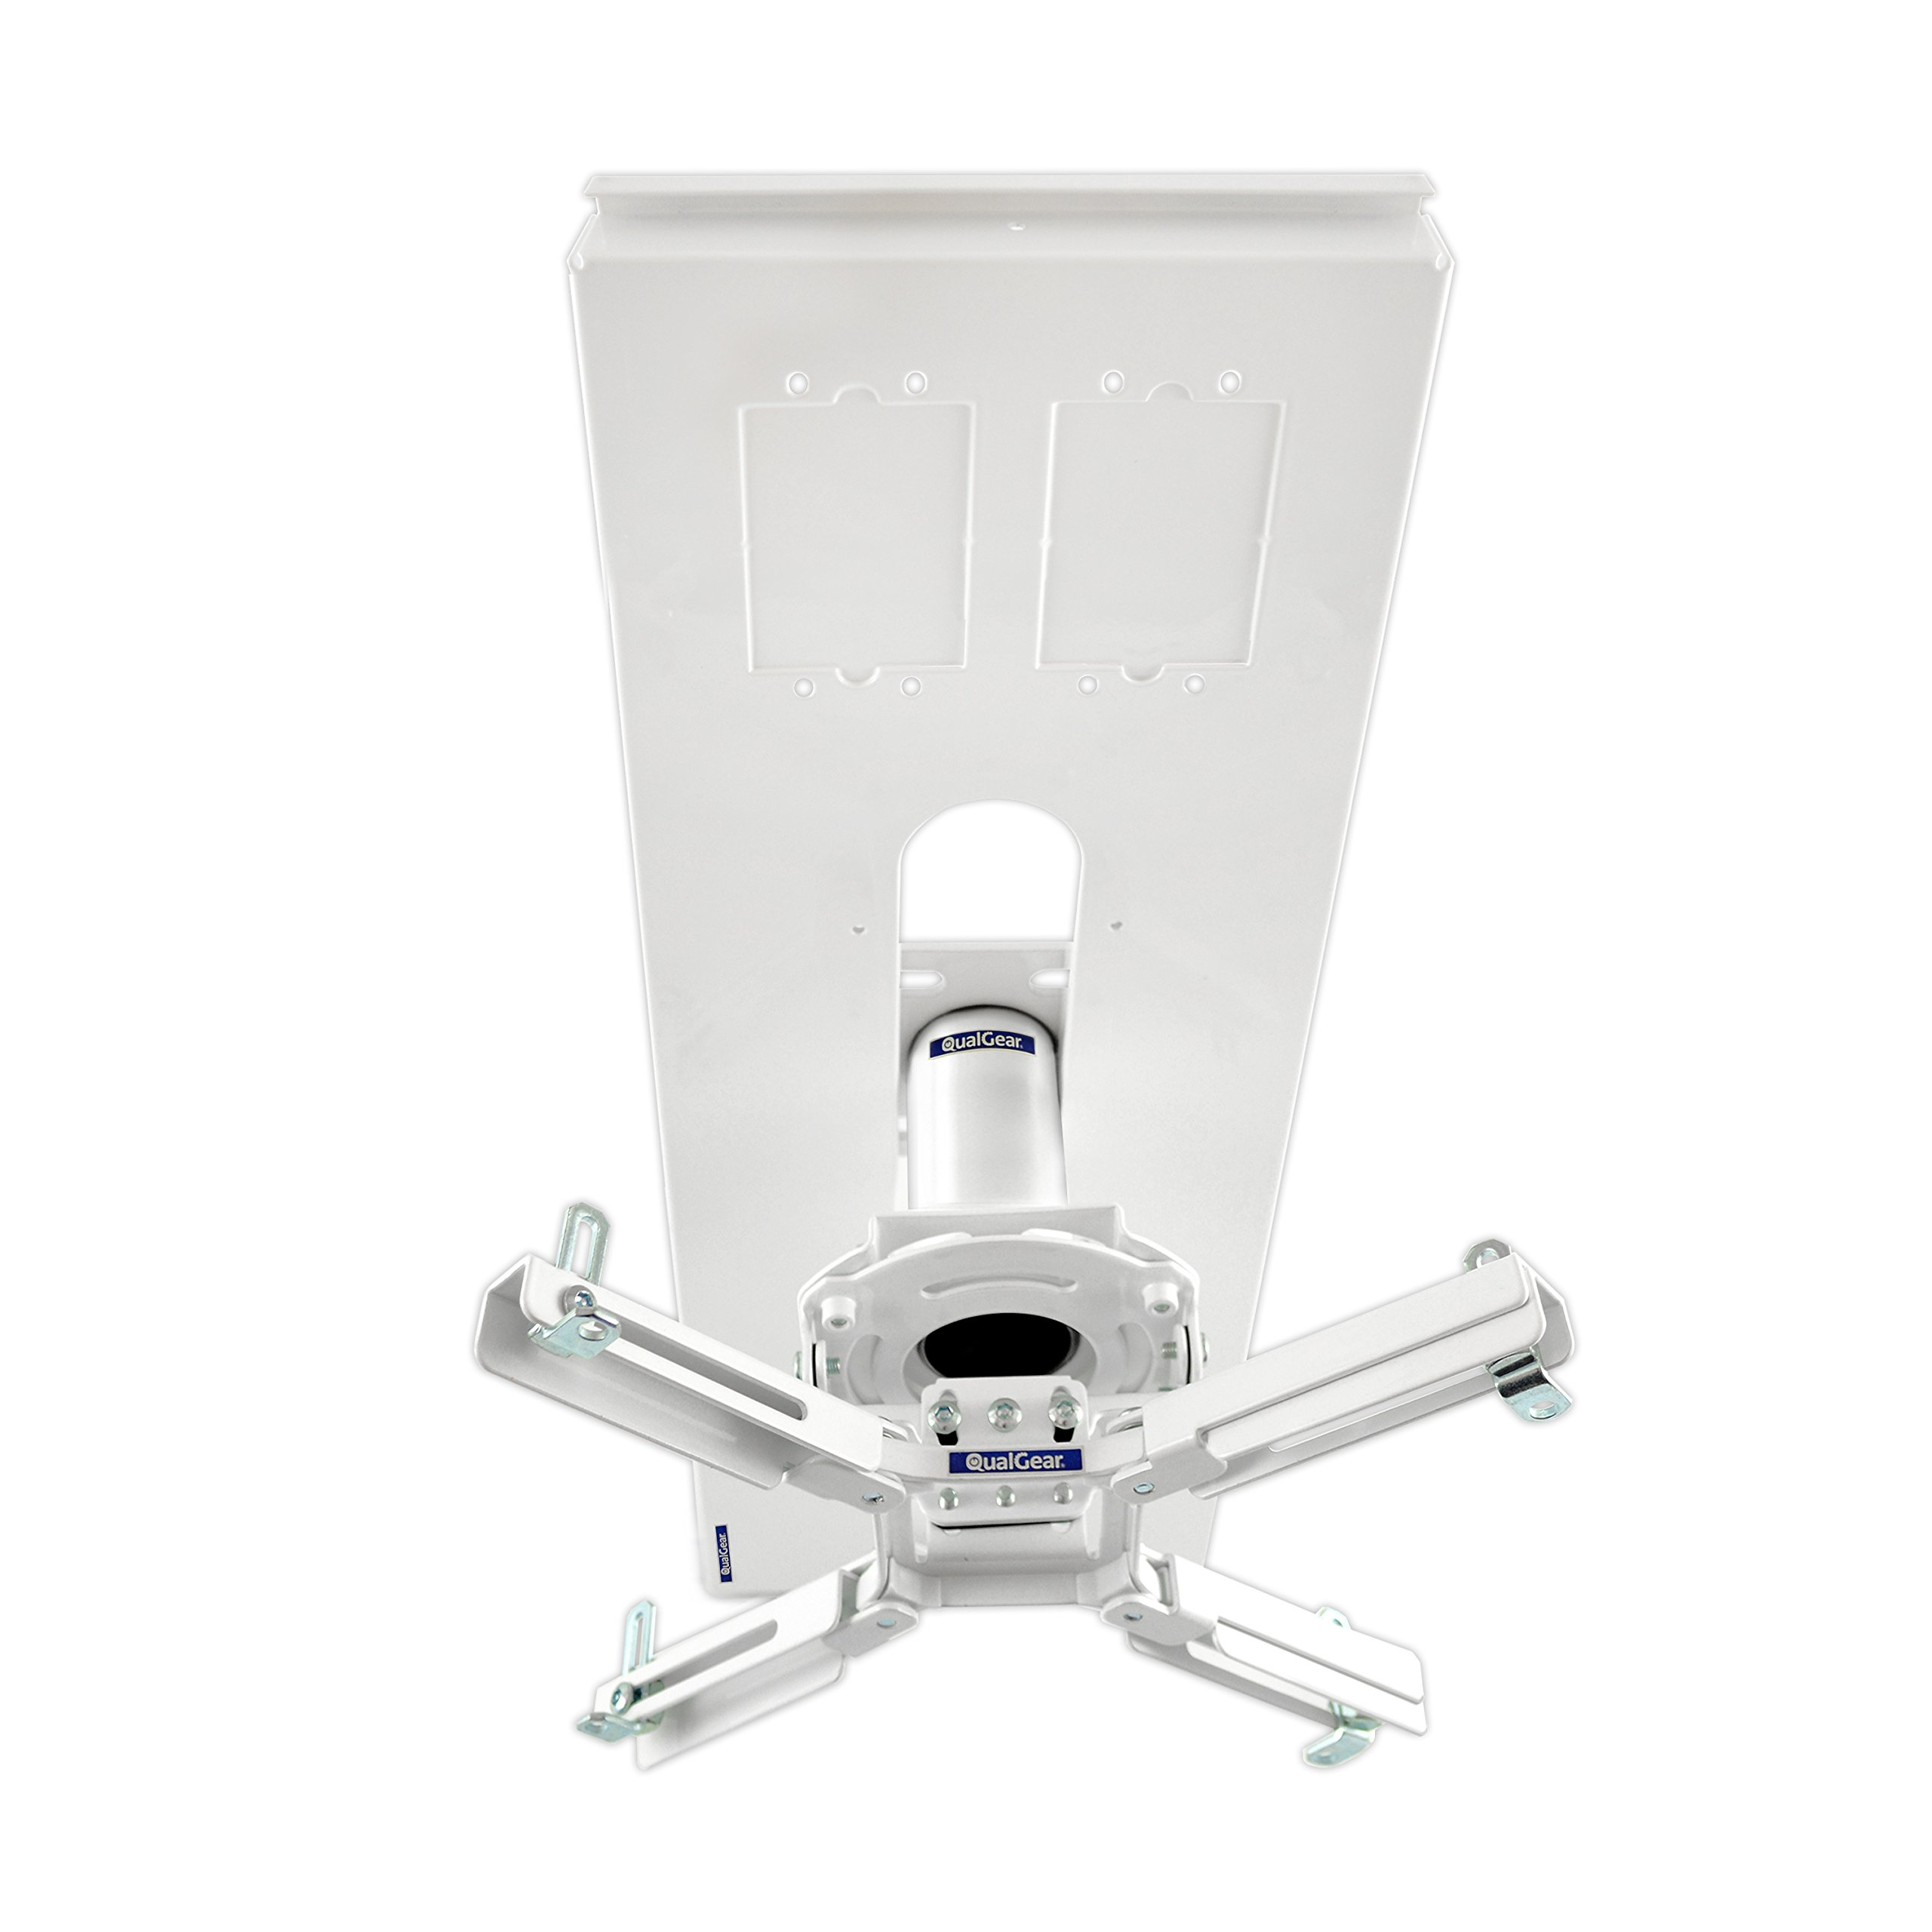 QualGear Pro-AV QG-KIT-S-3IN-W Projector Mount Kit Accessory Suspended Ceiling Adapter, 3'' 1.5'', White